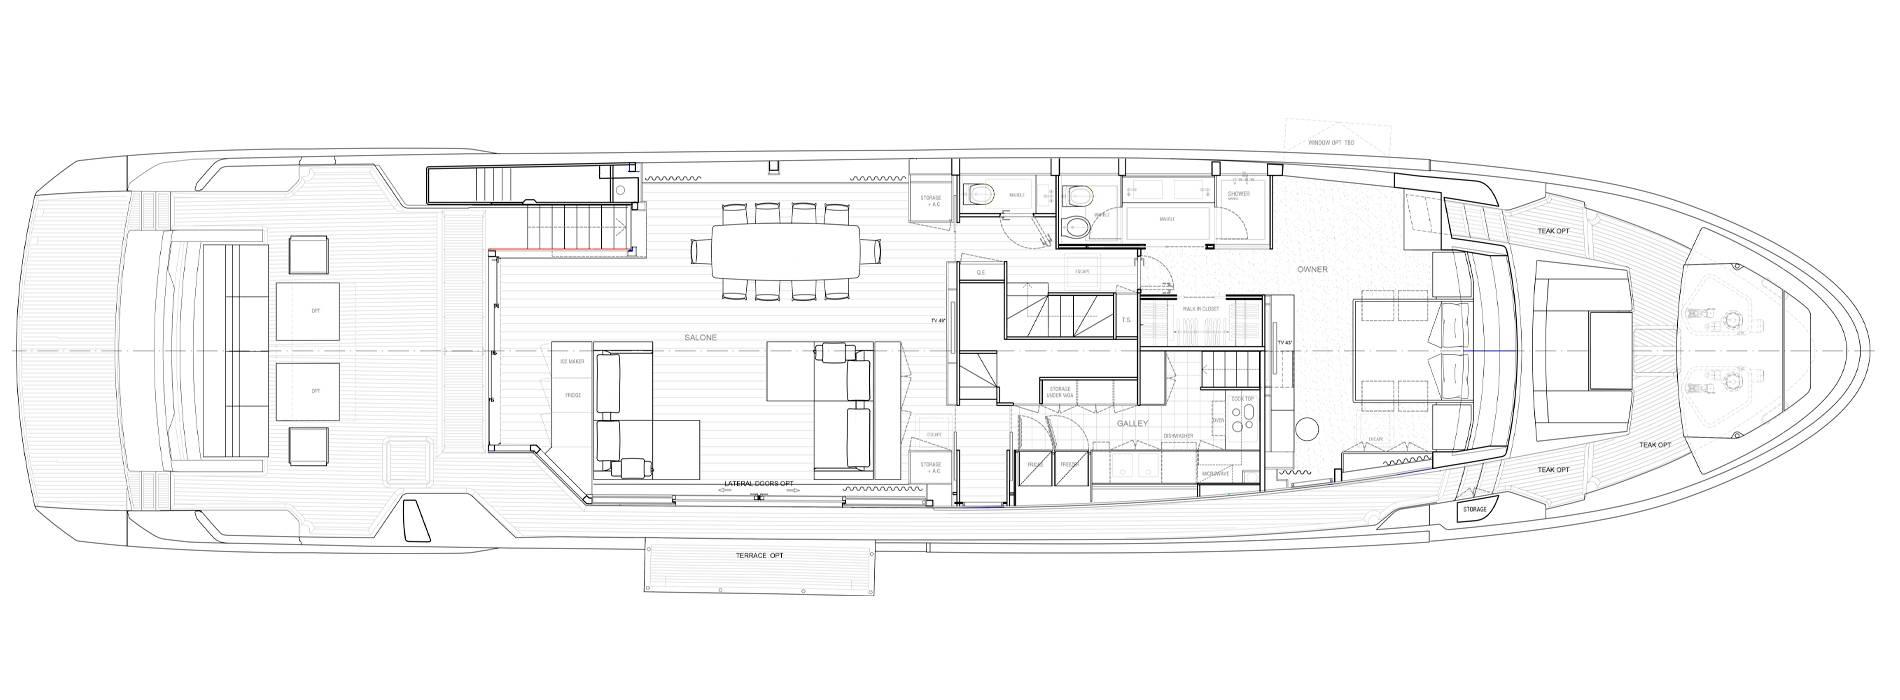 Sanlorenzo Yachts SL106 Asymmetric Cubierta principal